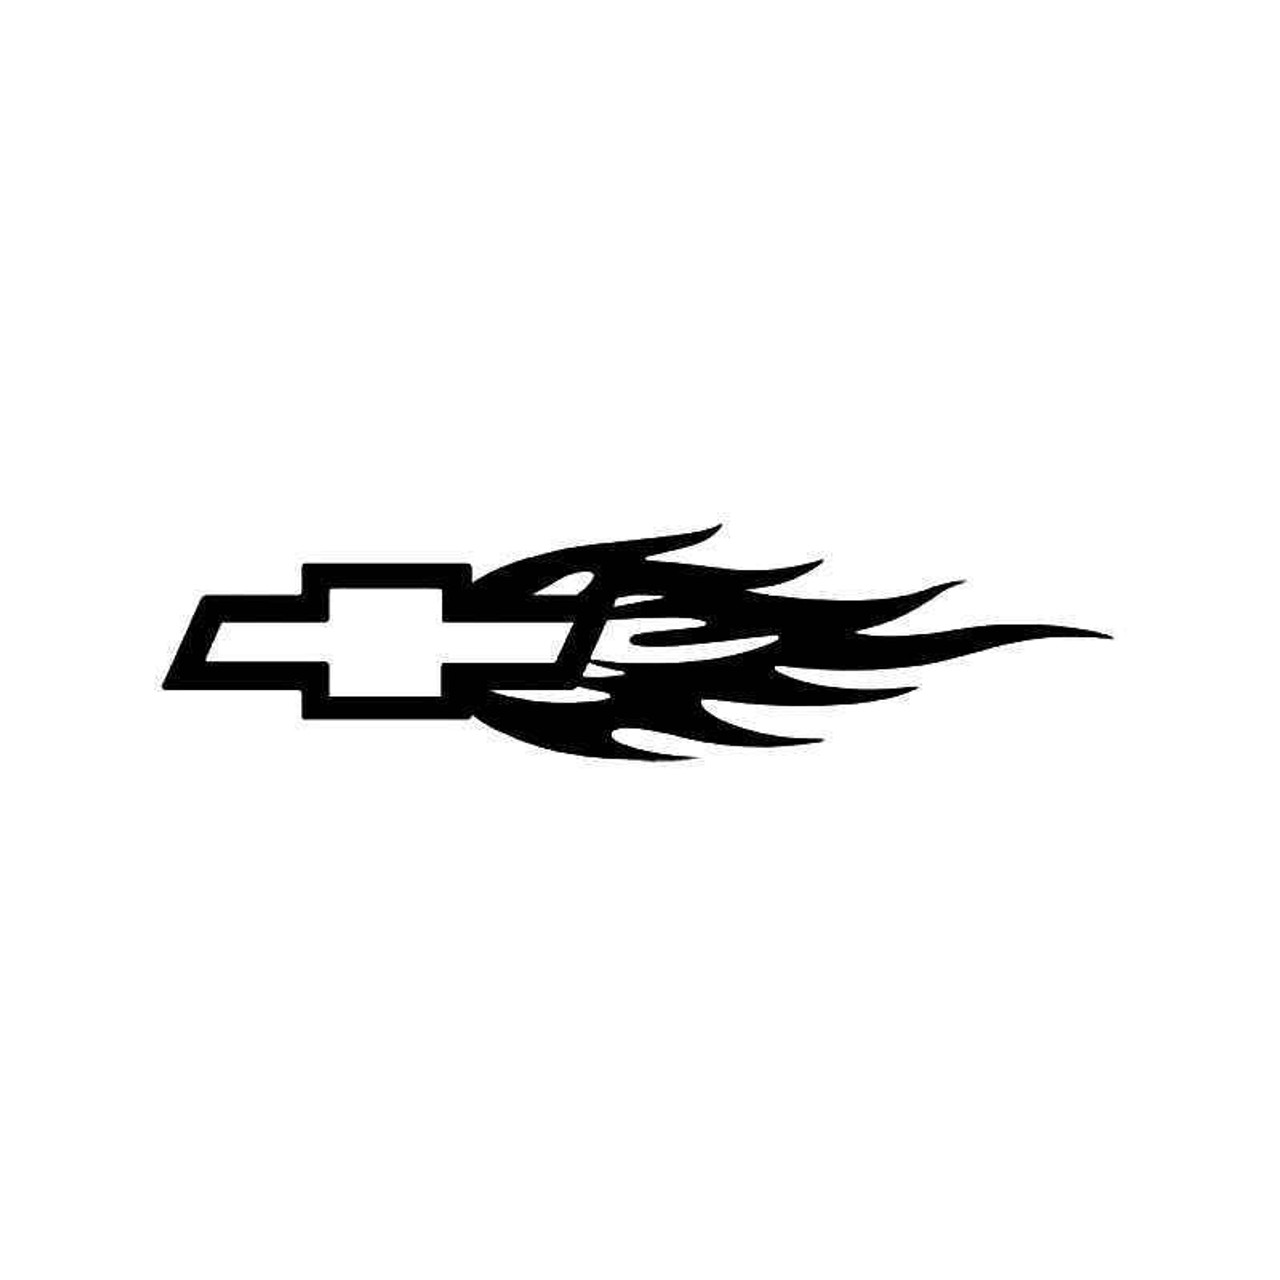 Chevy Bow Tie Flame 2 Vinyl Sticker